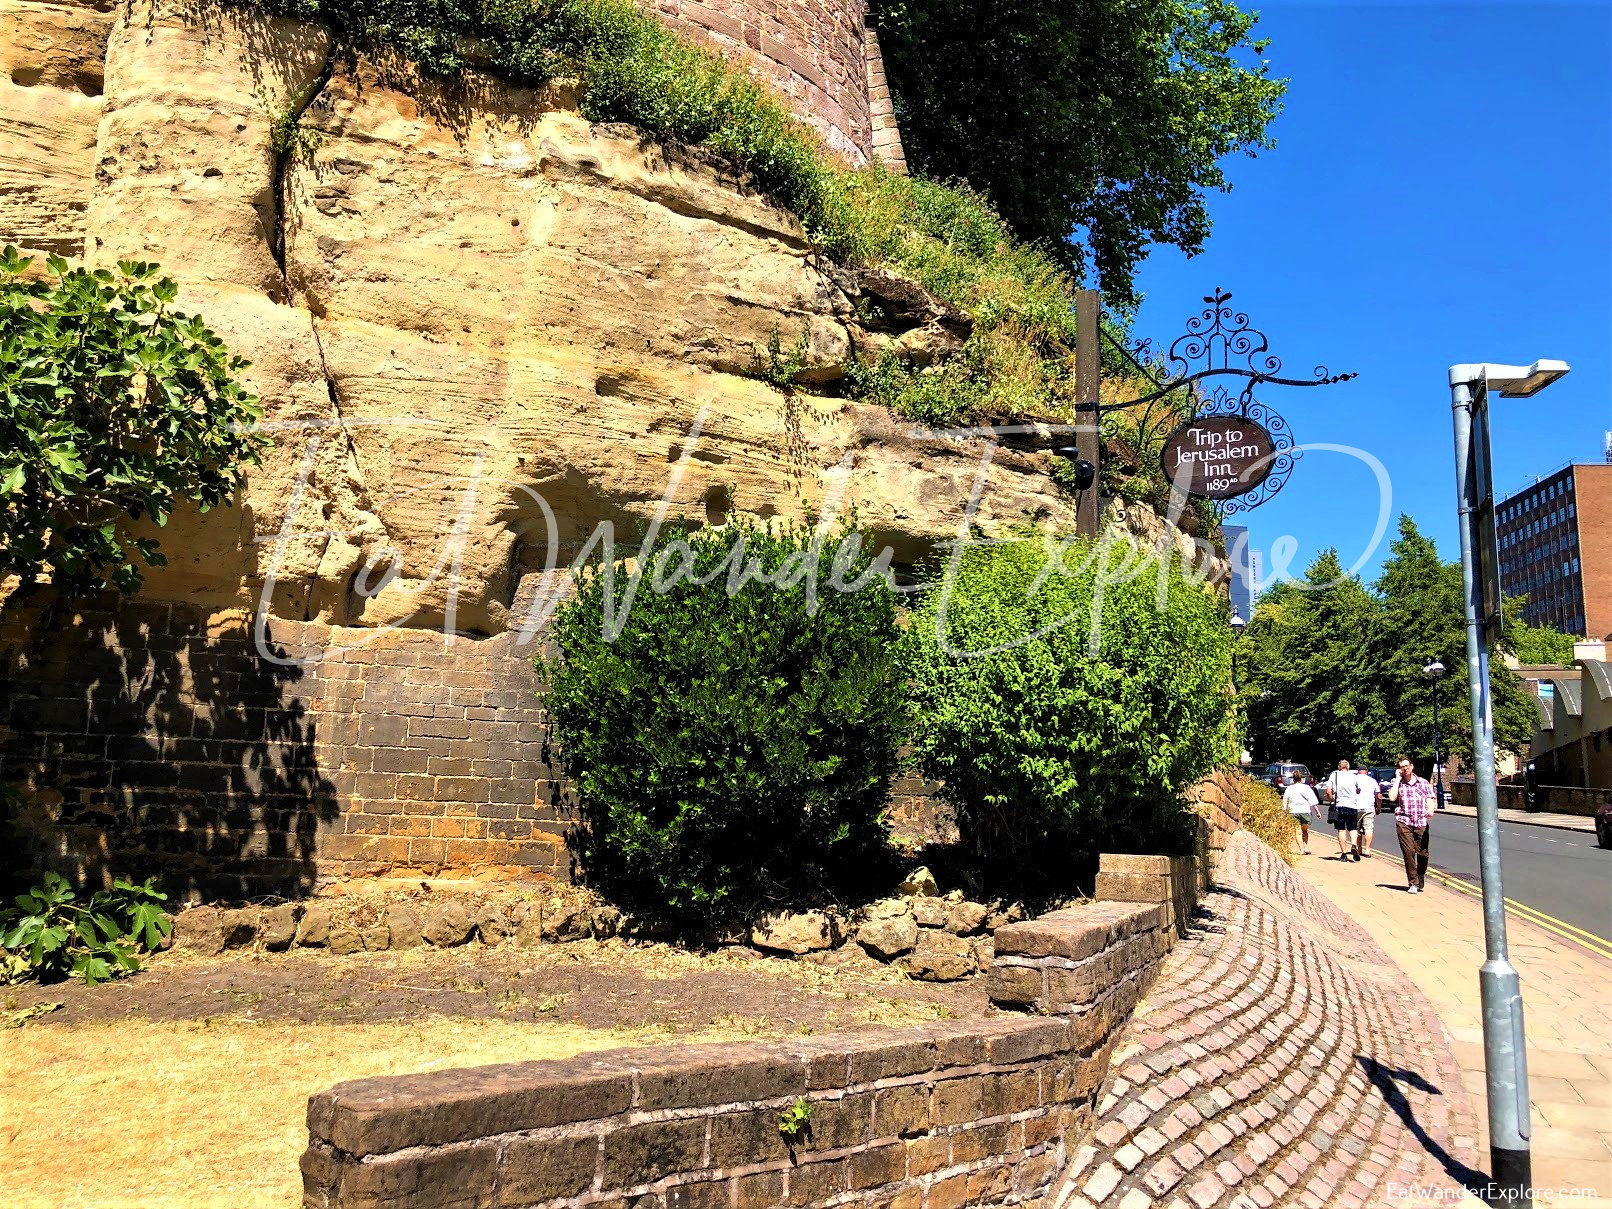 Nottingham castle wall next to Ye Olde Trip to Jerusalem